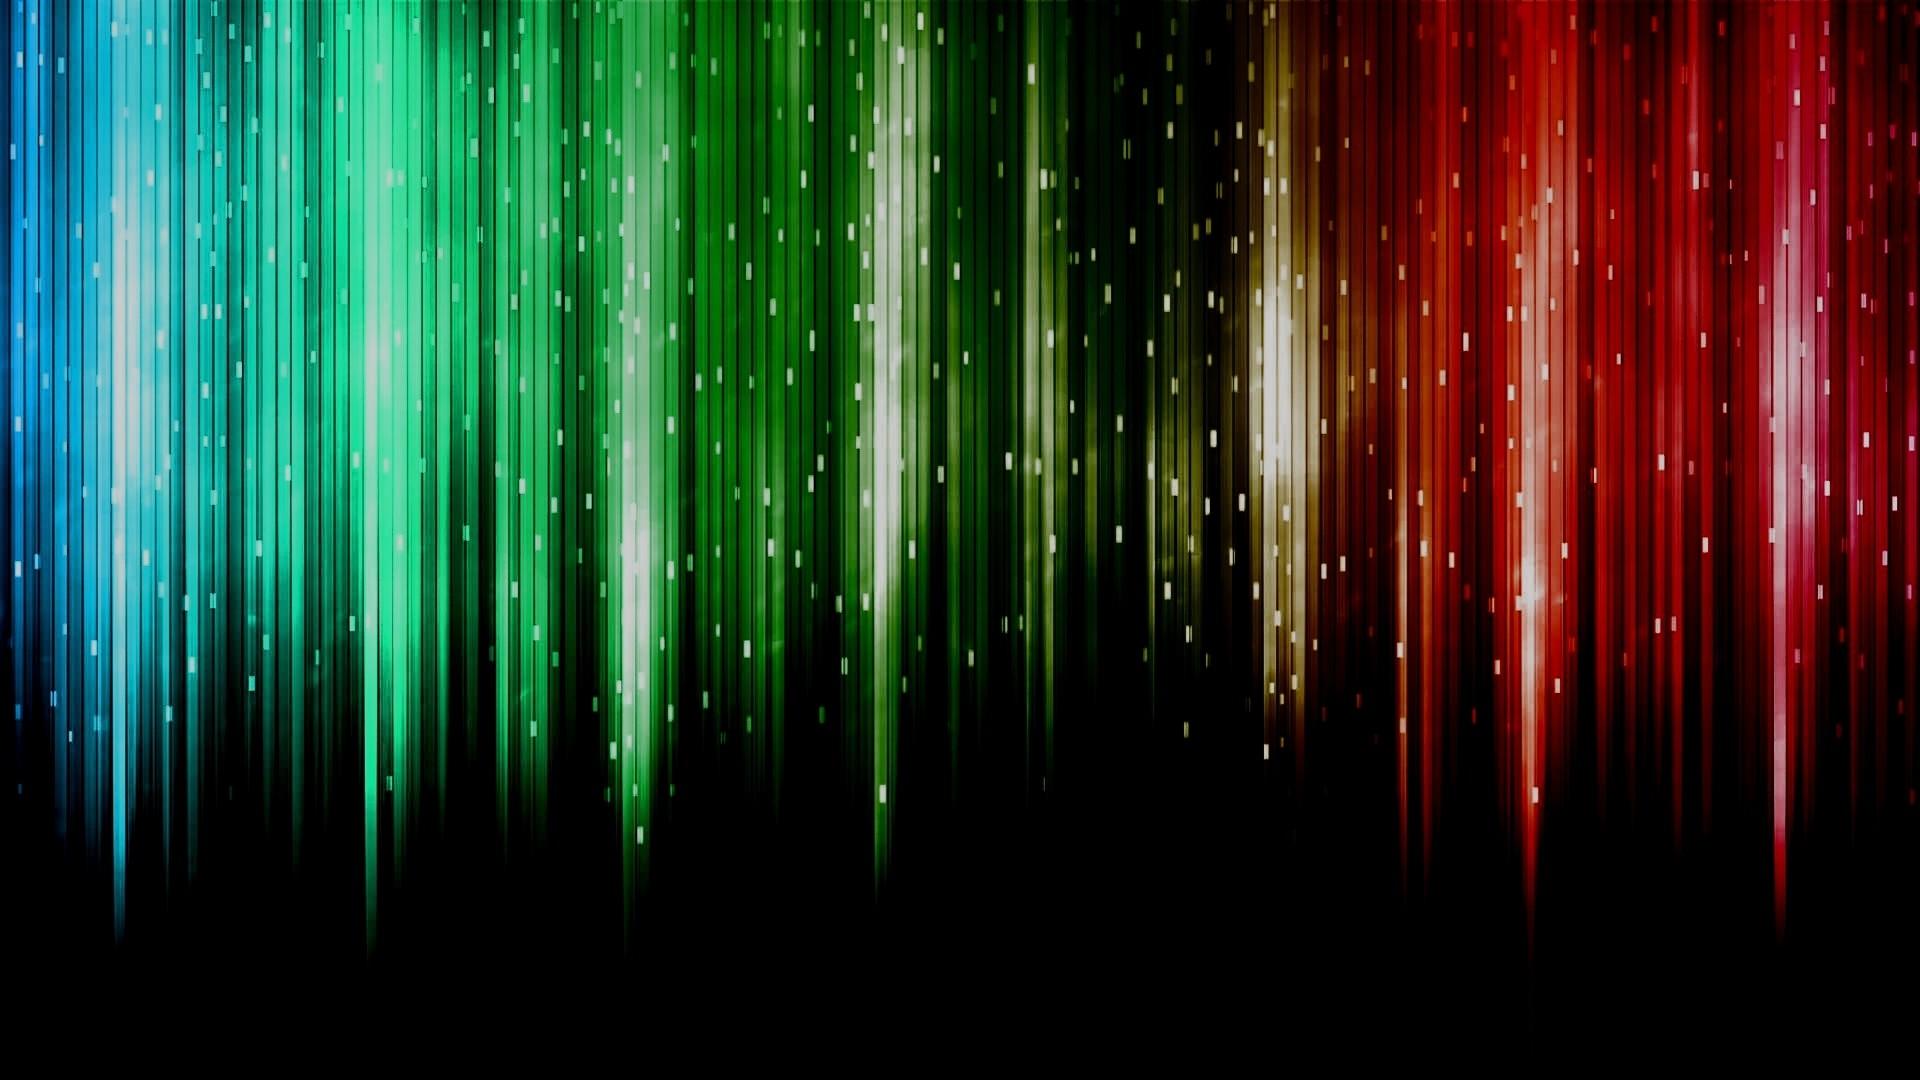 colorfull hd wallpaper 1920x1080 - photo #20